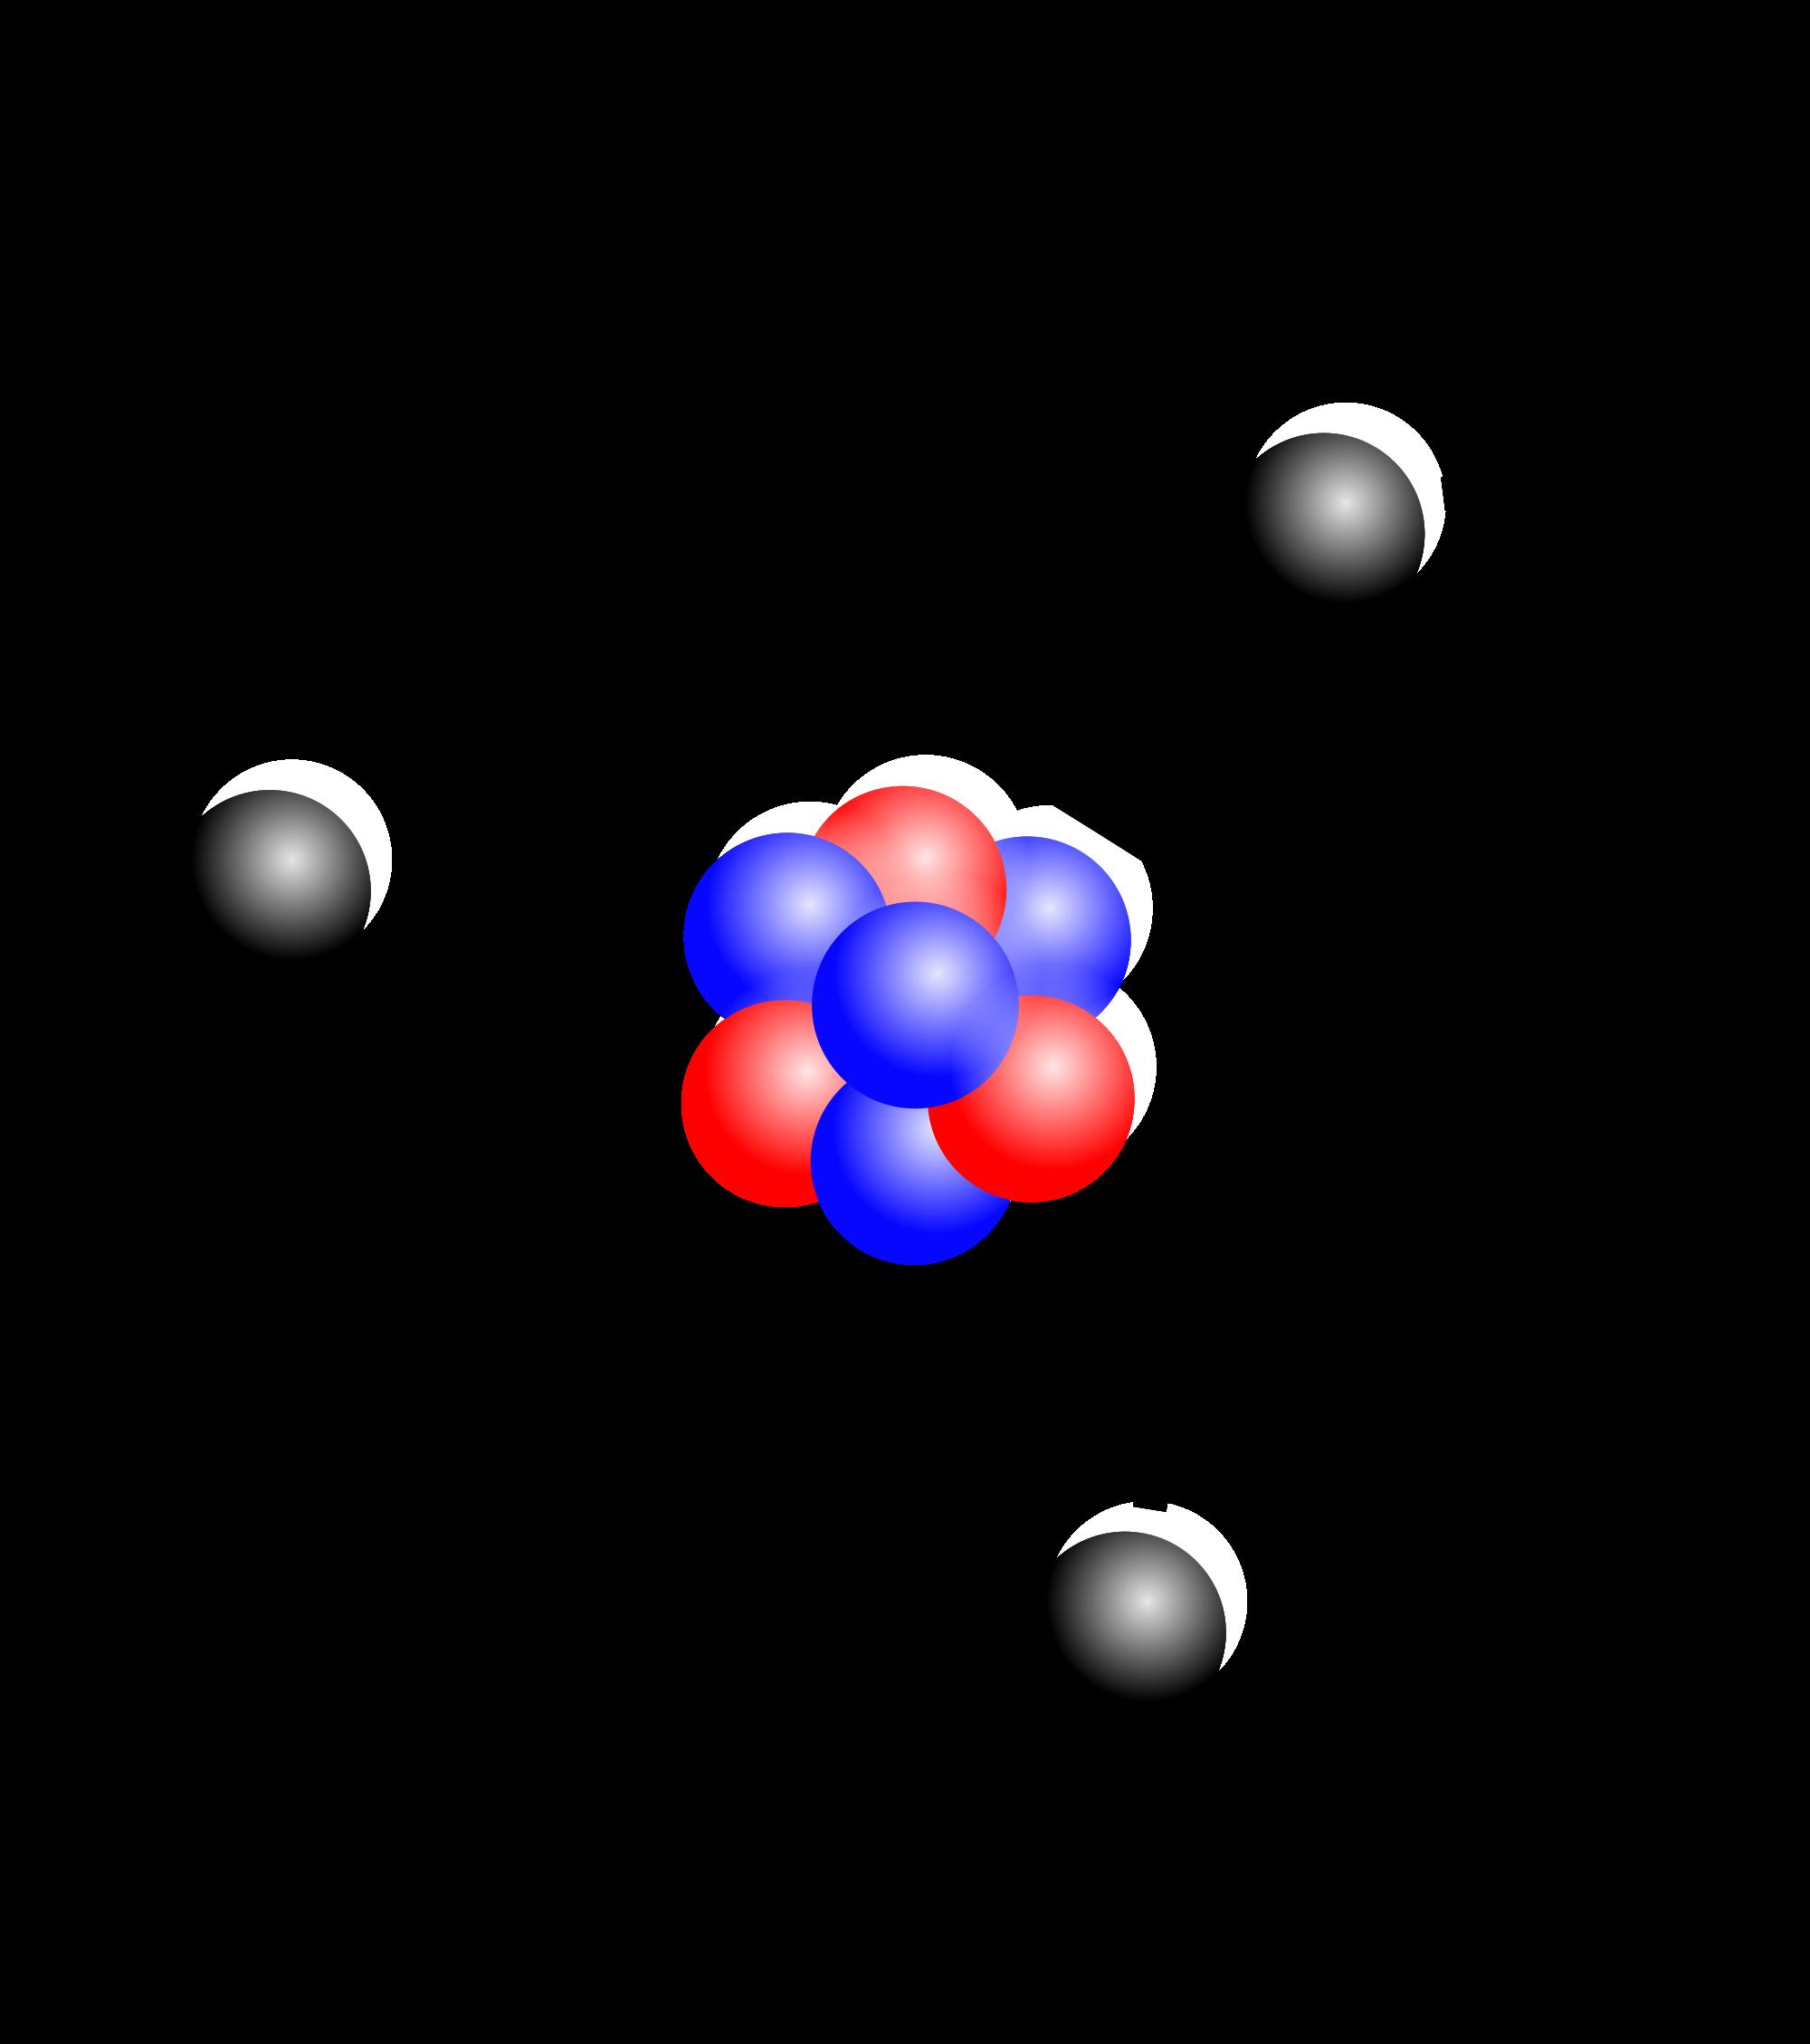 jpg transparent stock Image stylised lithium png. Atom clipart atom element